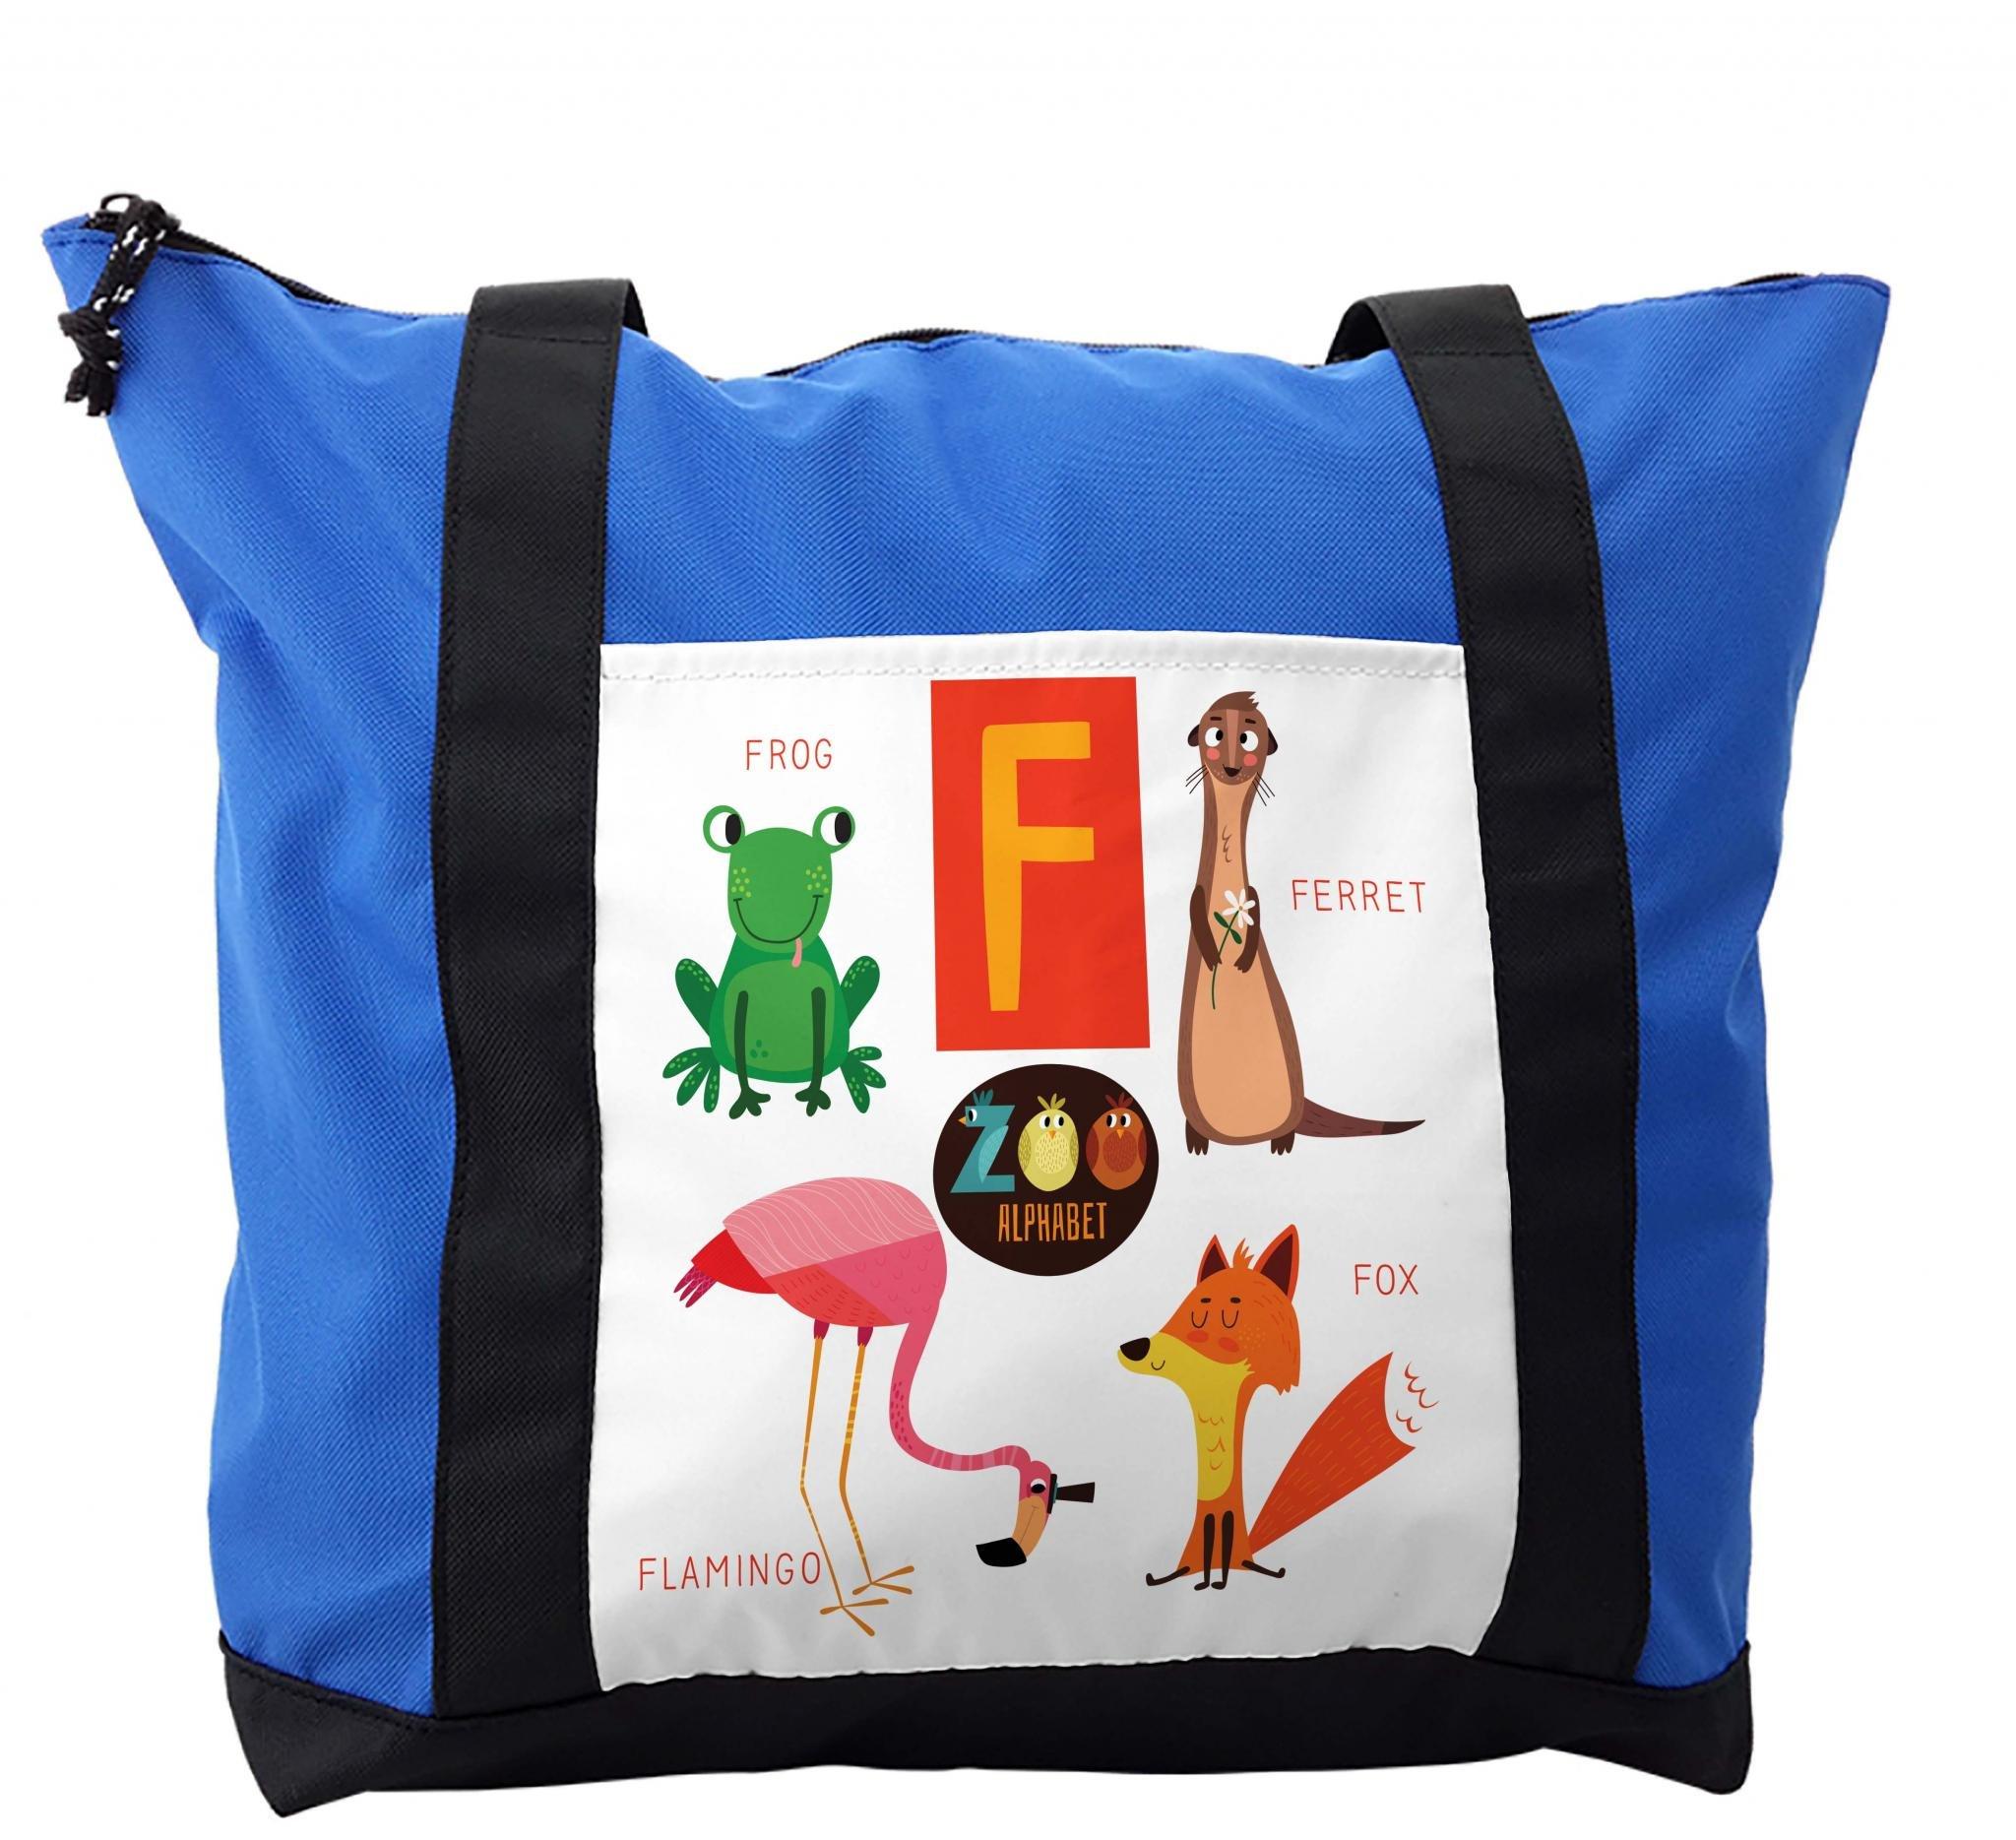 Lunarable ABC Kids Shoulder Bag, Flamingo Fox Frog Ferret, Durable with Zipper